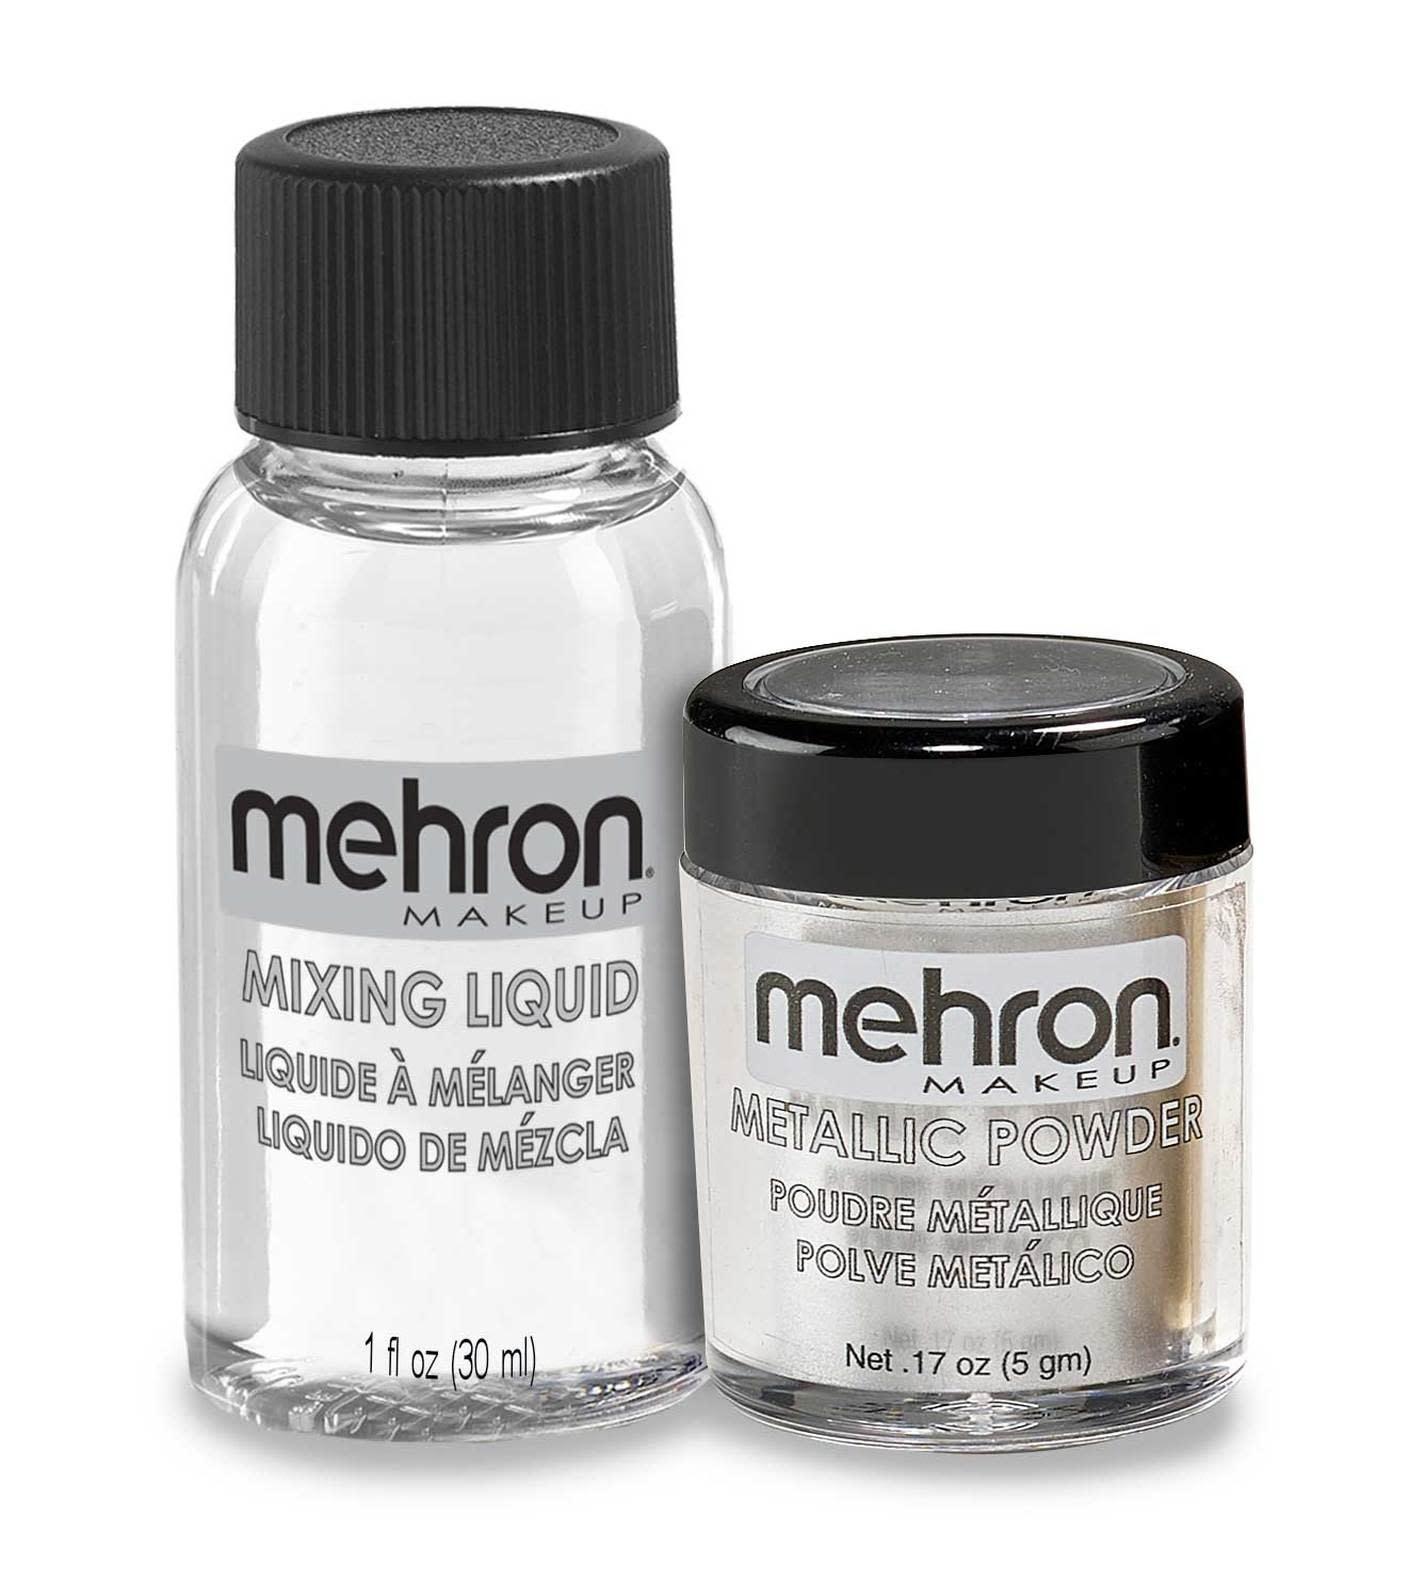 Mehron Metallic Powder with Mixing Liquid Silver